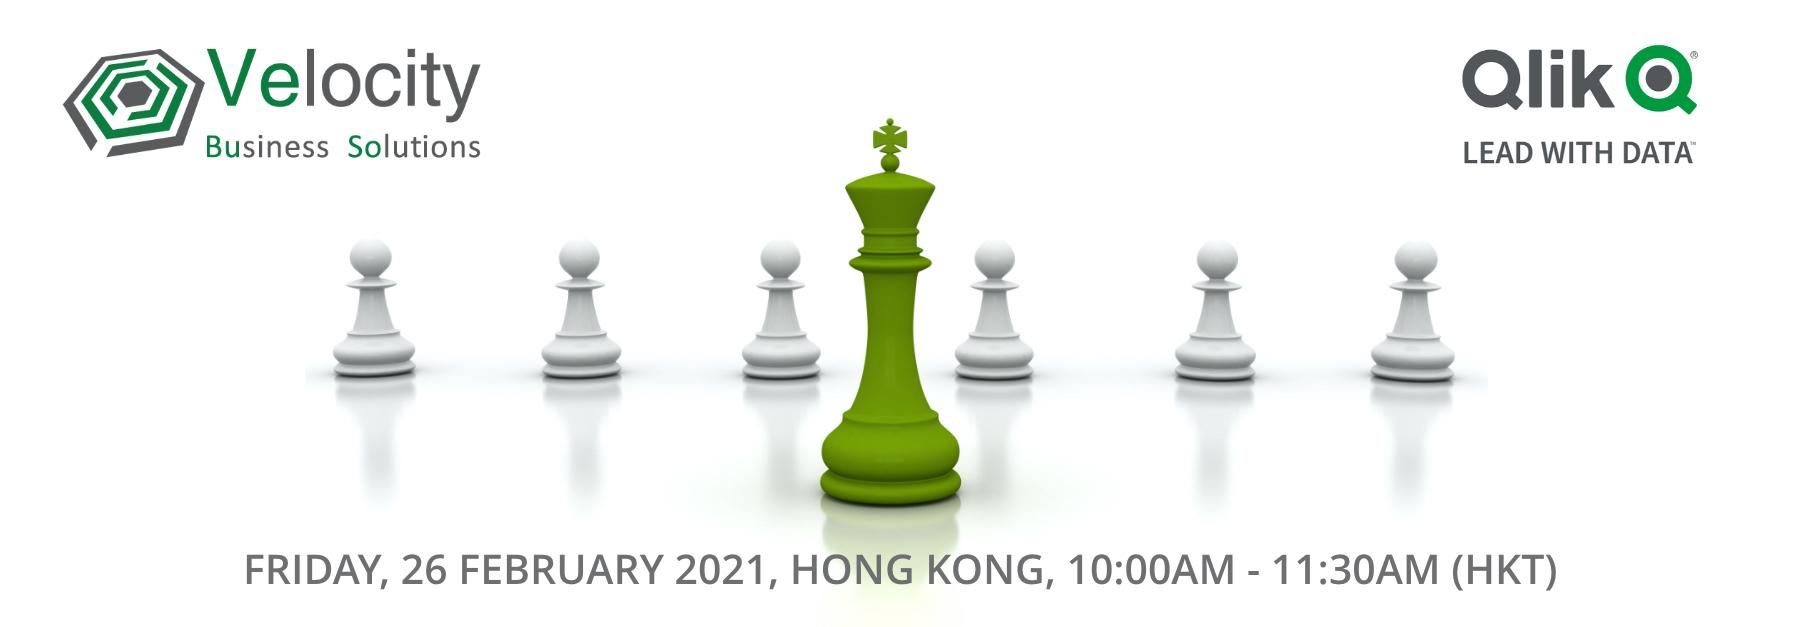 img-qlik-sense-webinar-banner-20210226